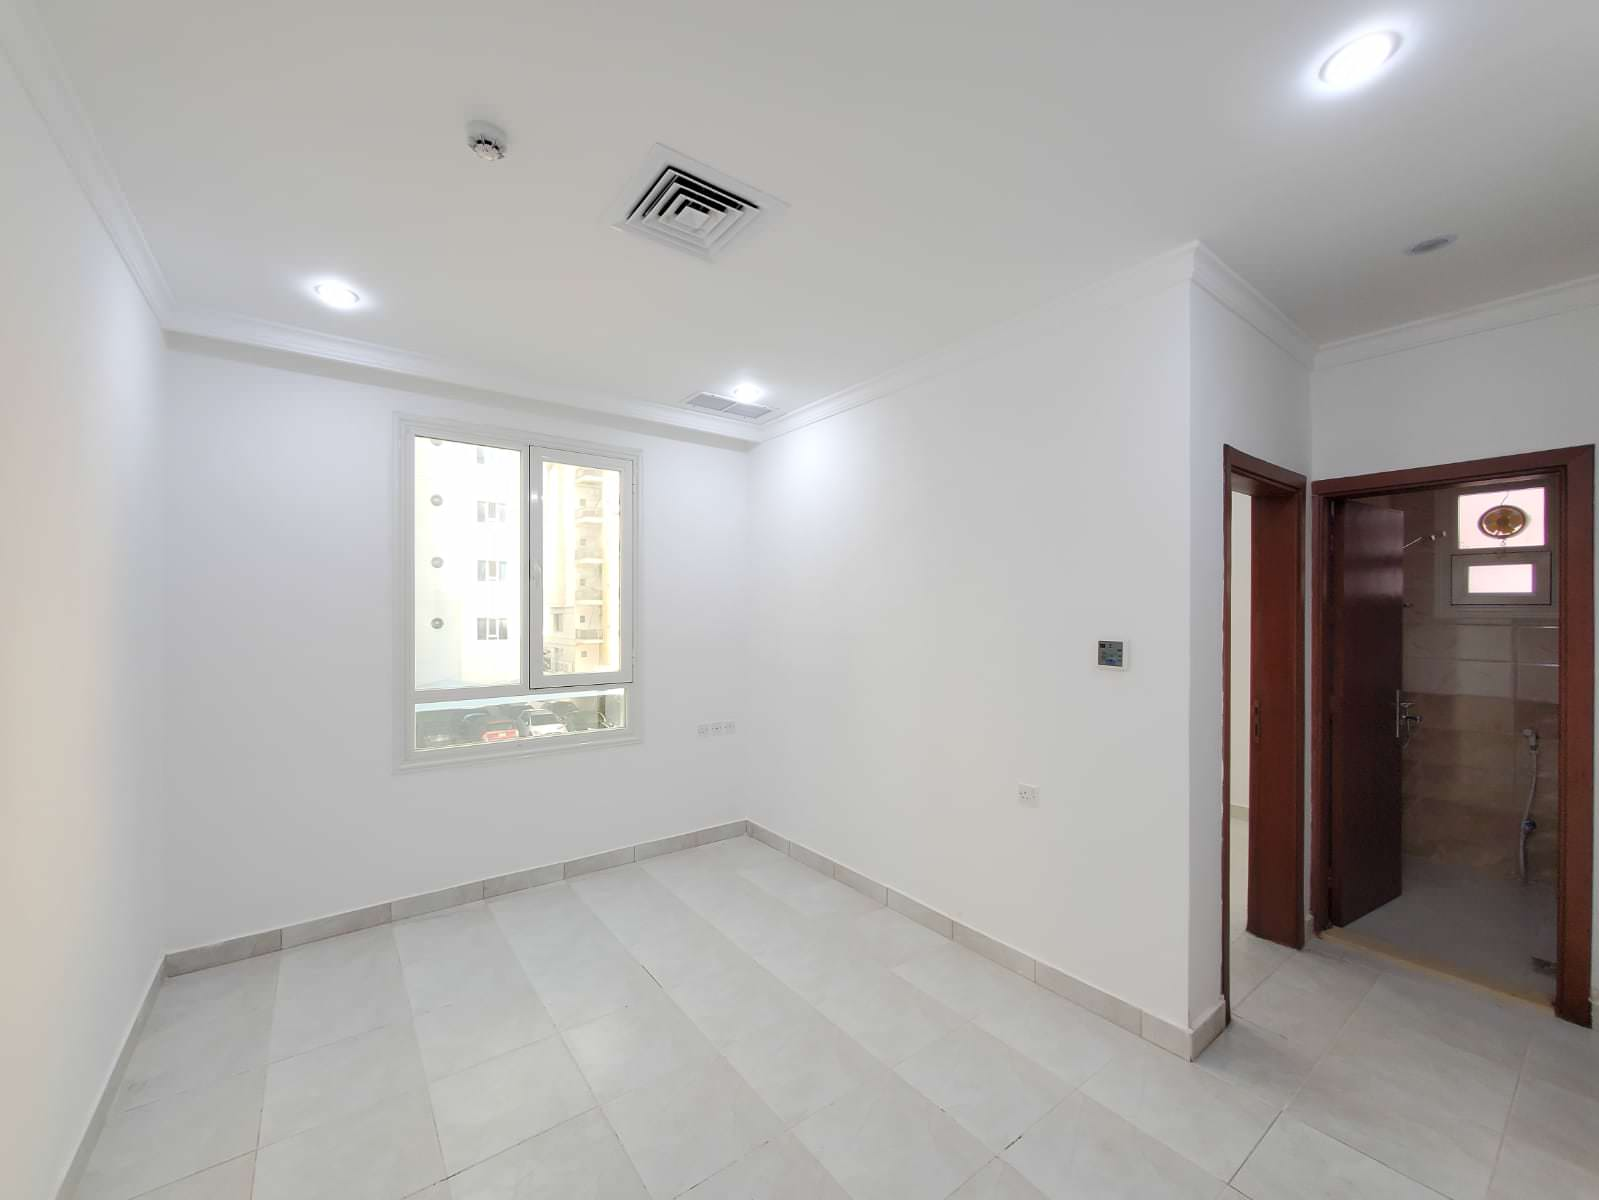 Salmiya – small, unfurnished, one bedroom apartment